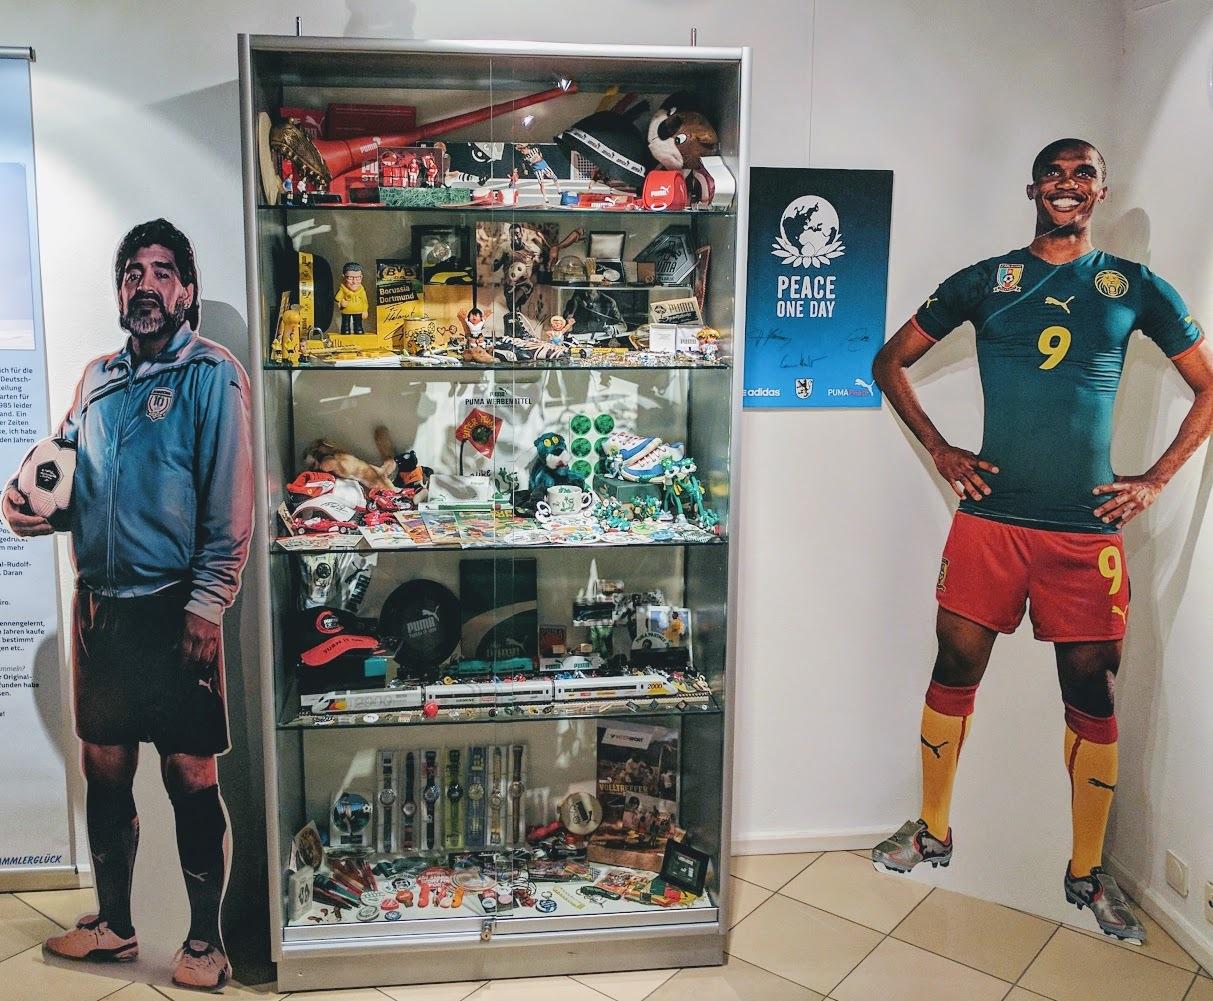 Adidas vs. Puma ᄄC Wie eine Familienfehde zwei Sportriesen